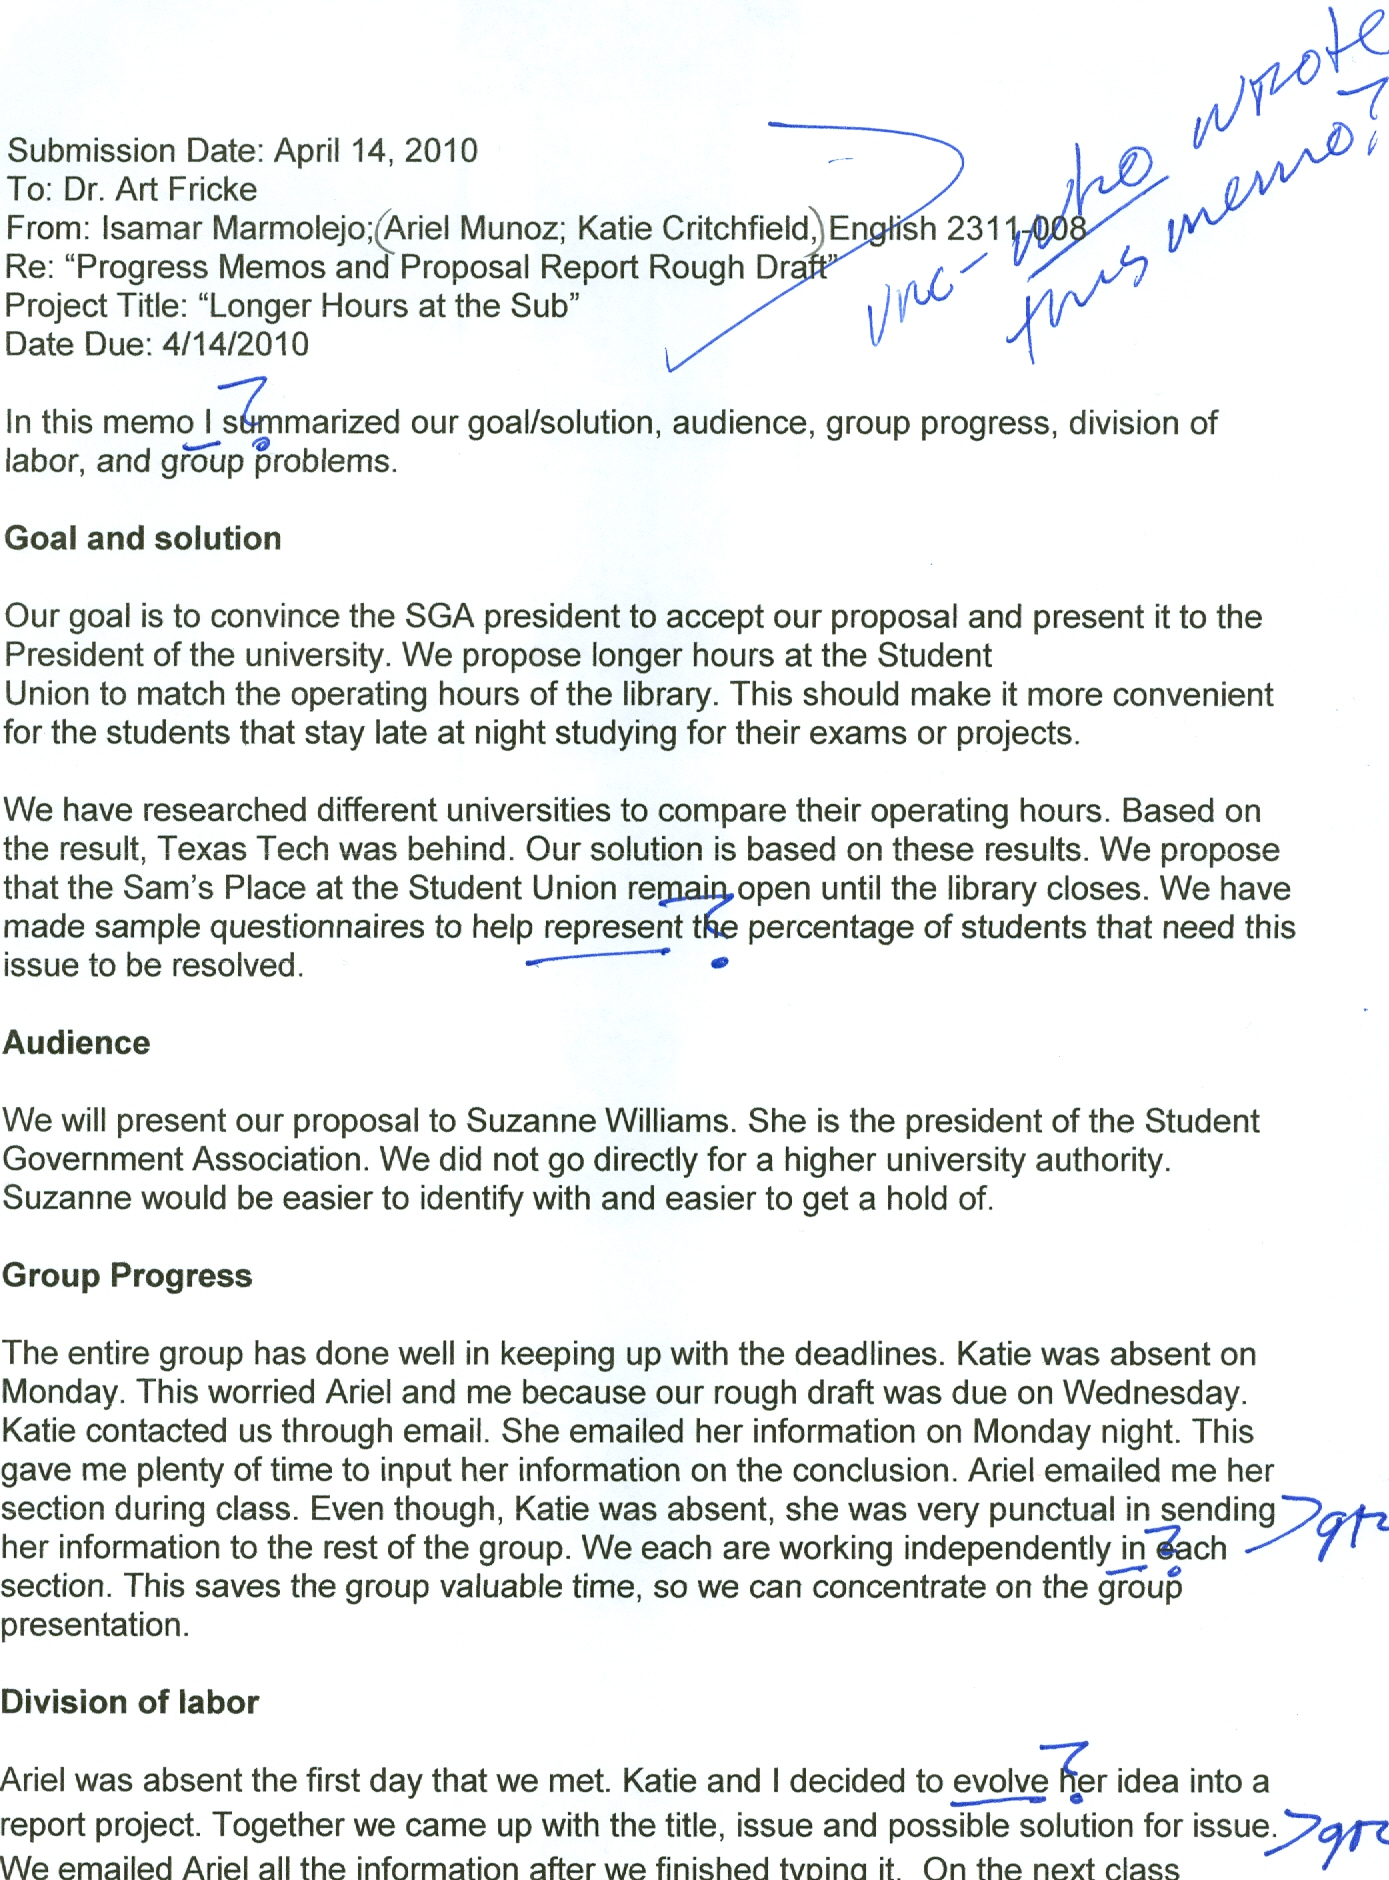 Progress Memos And Proposal Report Rough Draft Ariel's Blog